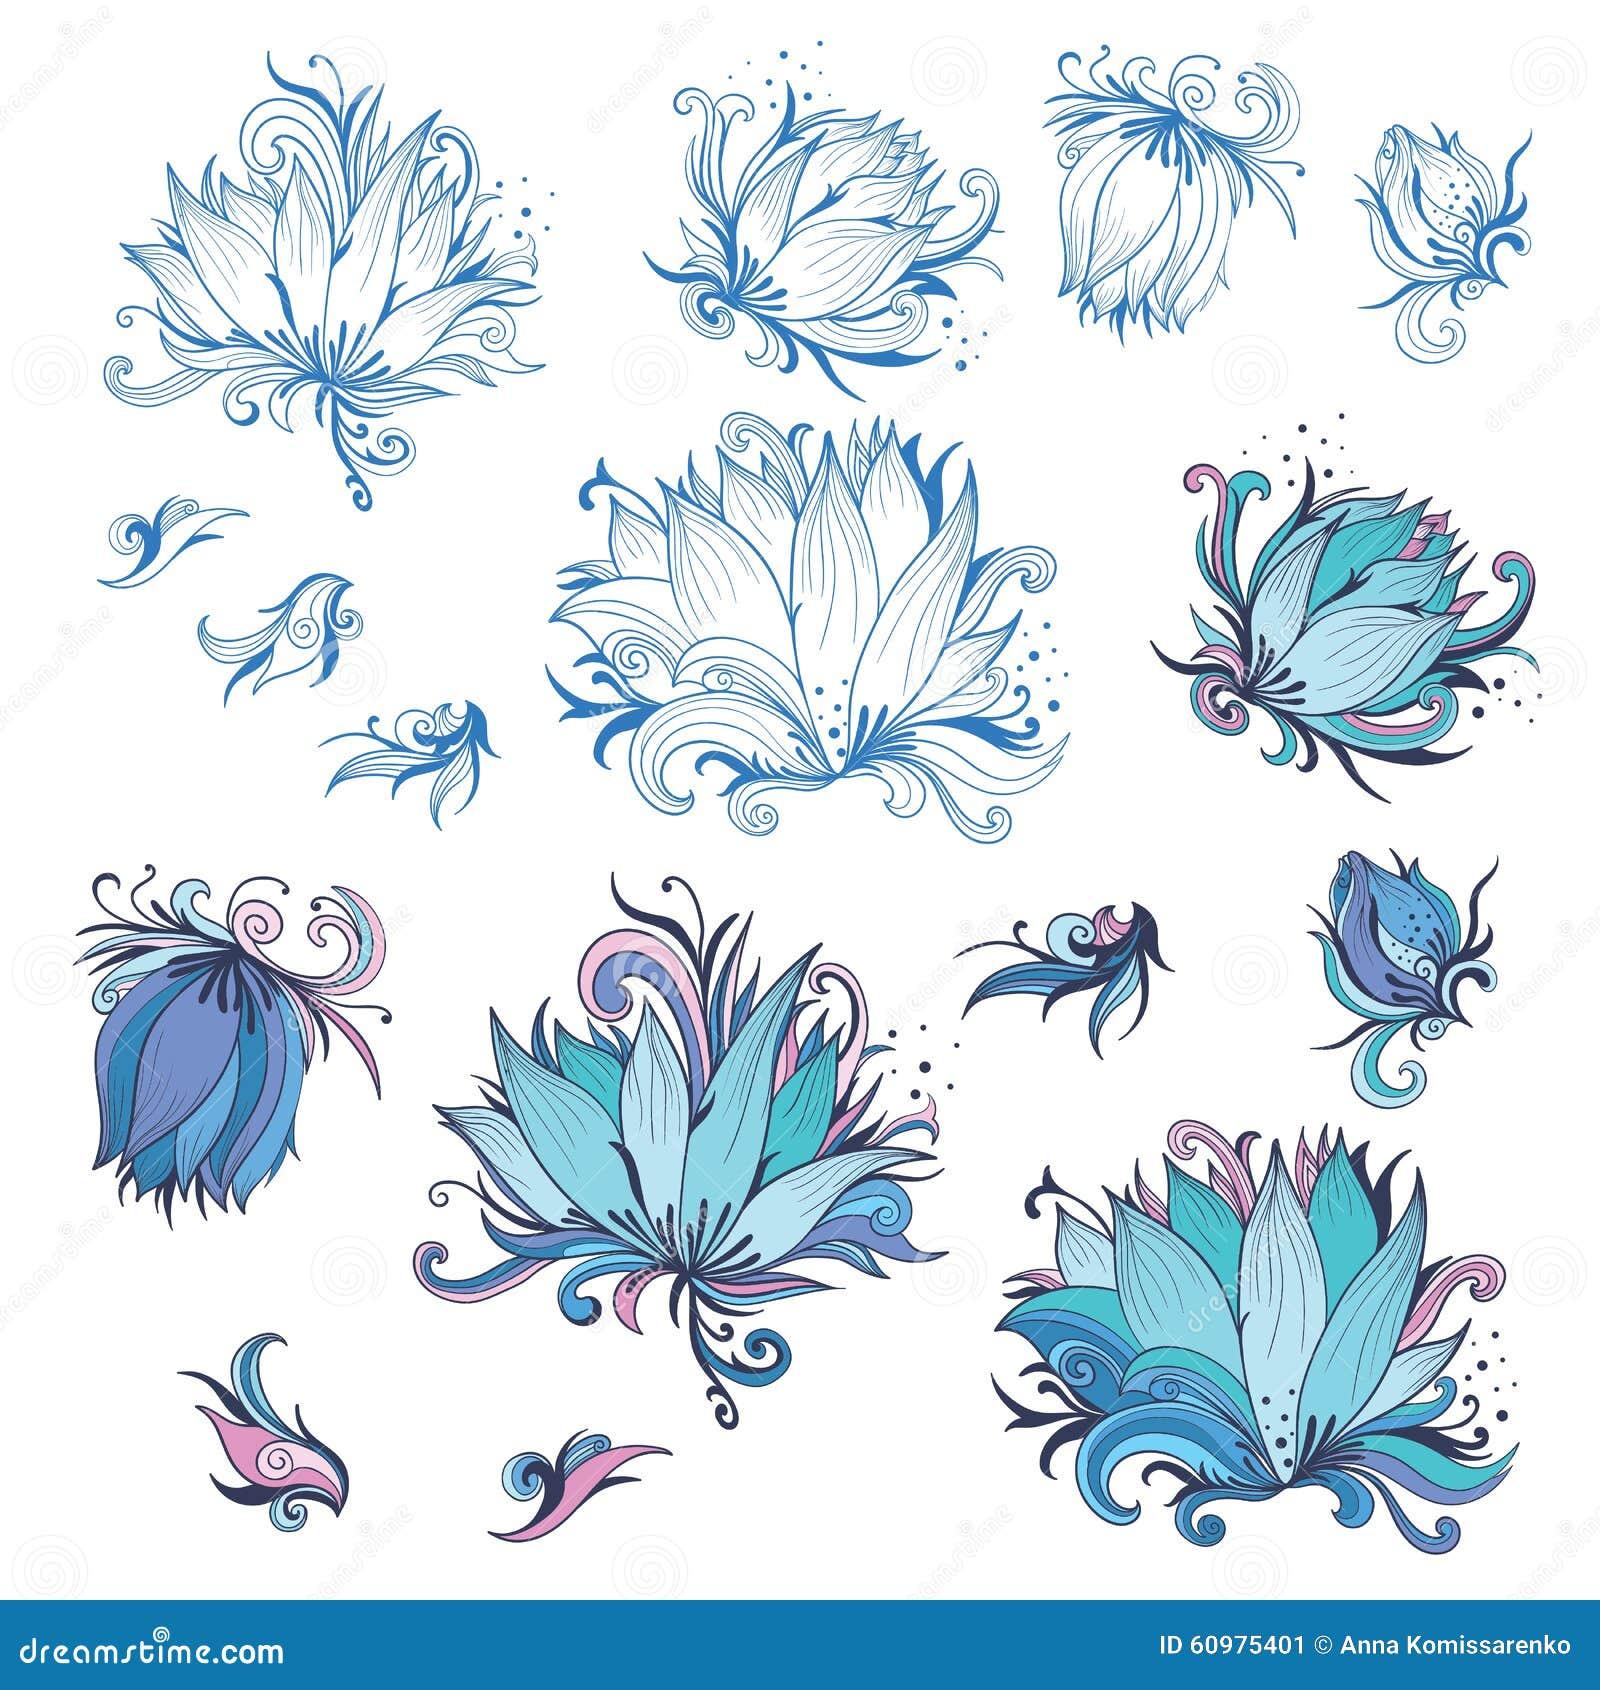 Lily flower design elements set stock vector image 60975401 collection design floral flower lily dhlflorist Images